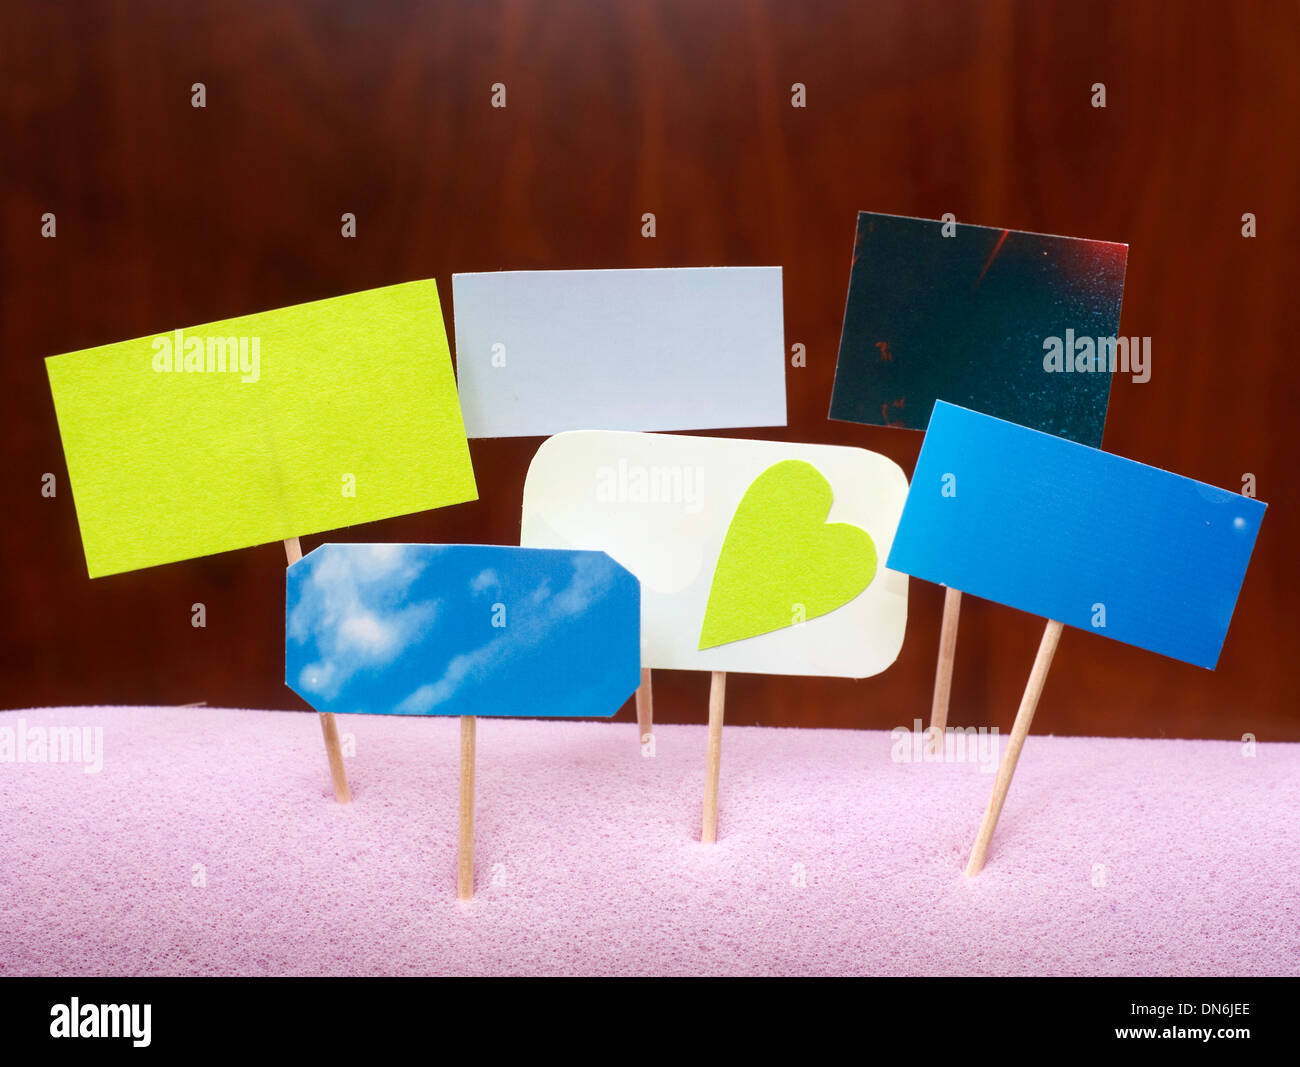 advertise blank on wood texture - Stock Image